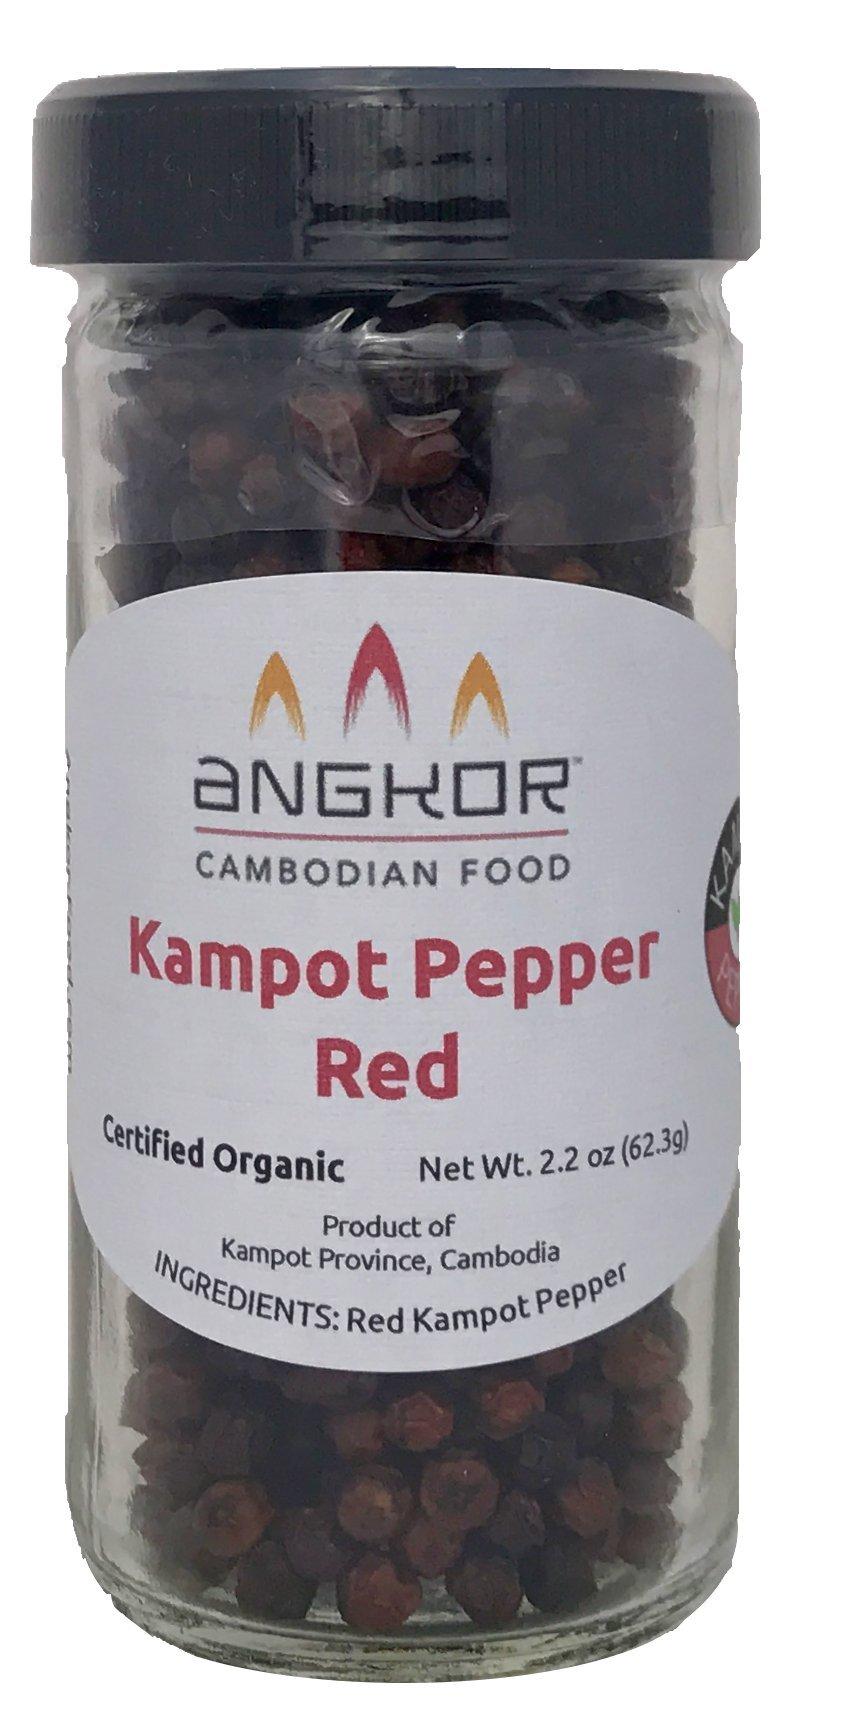 Organic Kampot Pepper (ម្រេចកំពត); Red 2.2oz by Angkor Cambodian Food